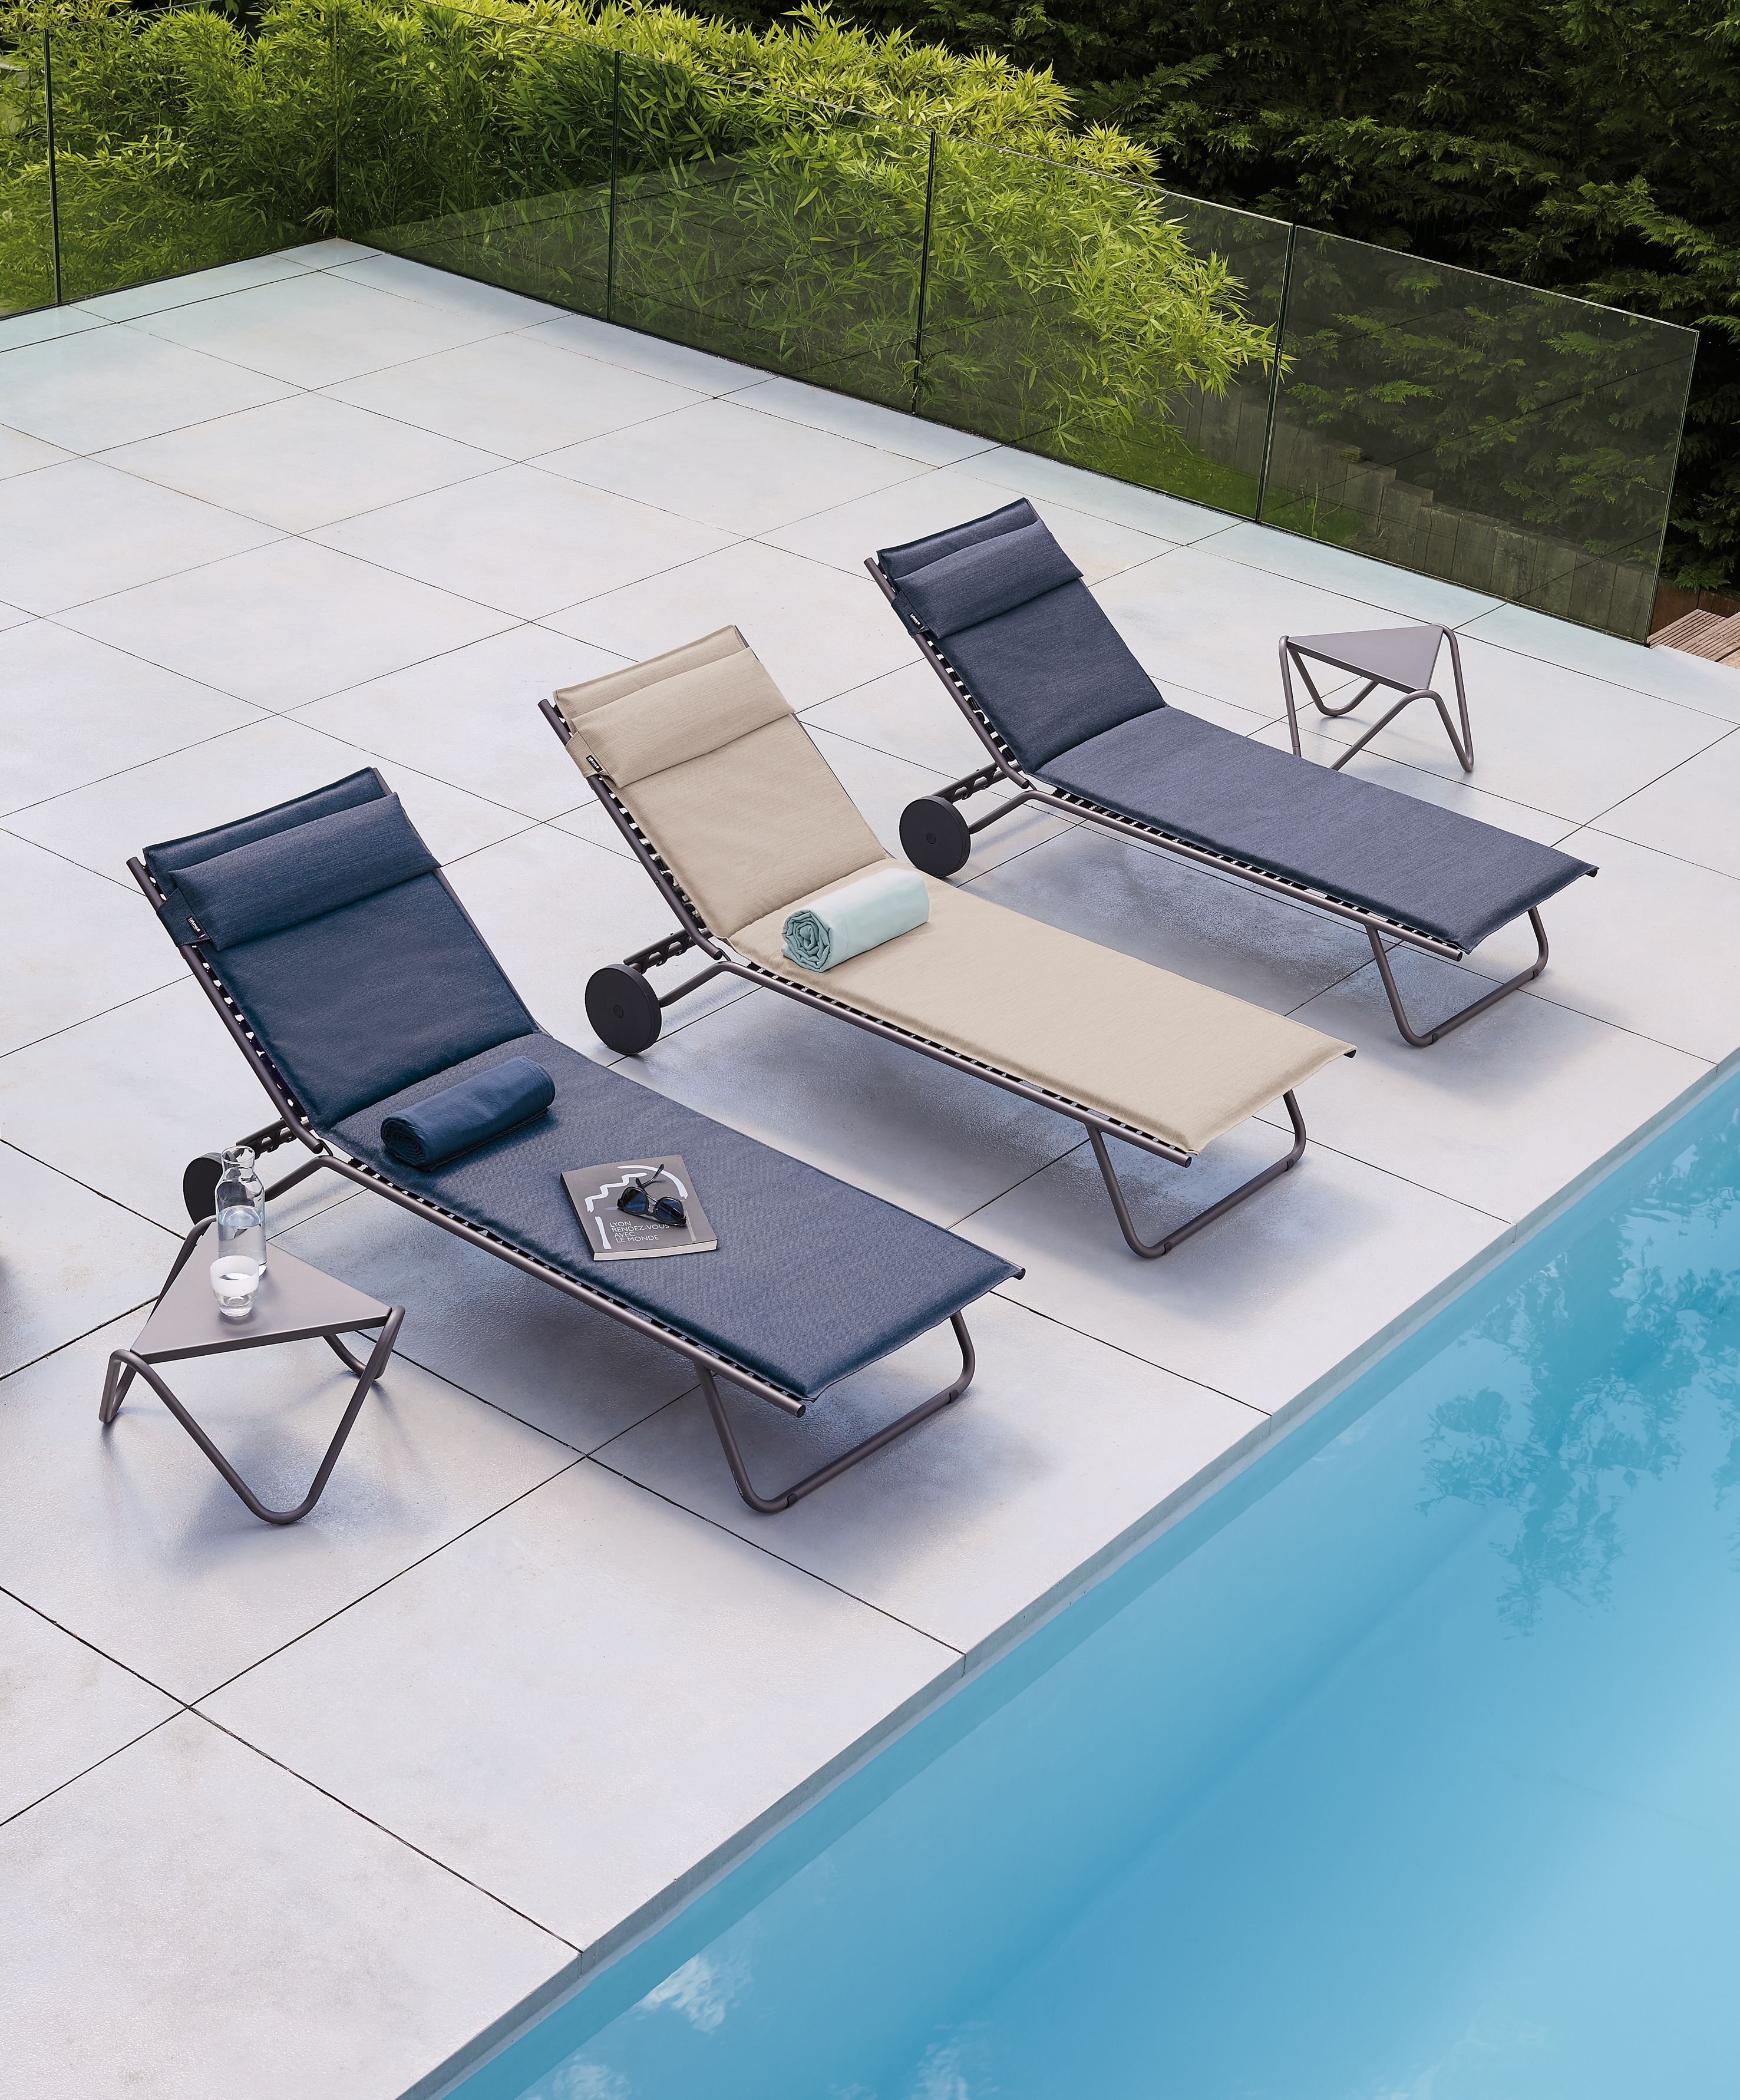 cordon elastique pour transat lafuma interesting with. Black Bedroom Furniture Sets. Home Design Ideas